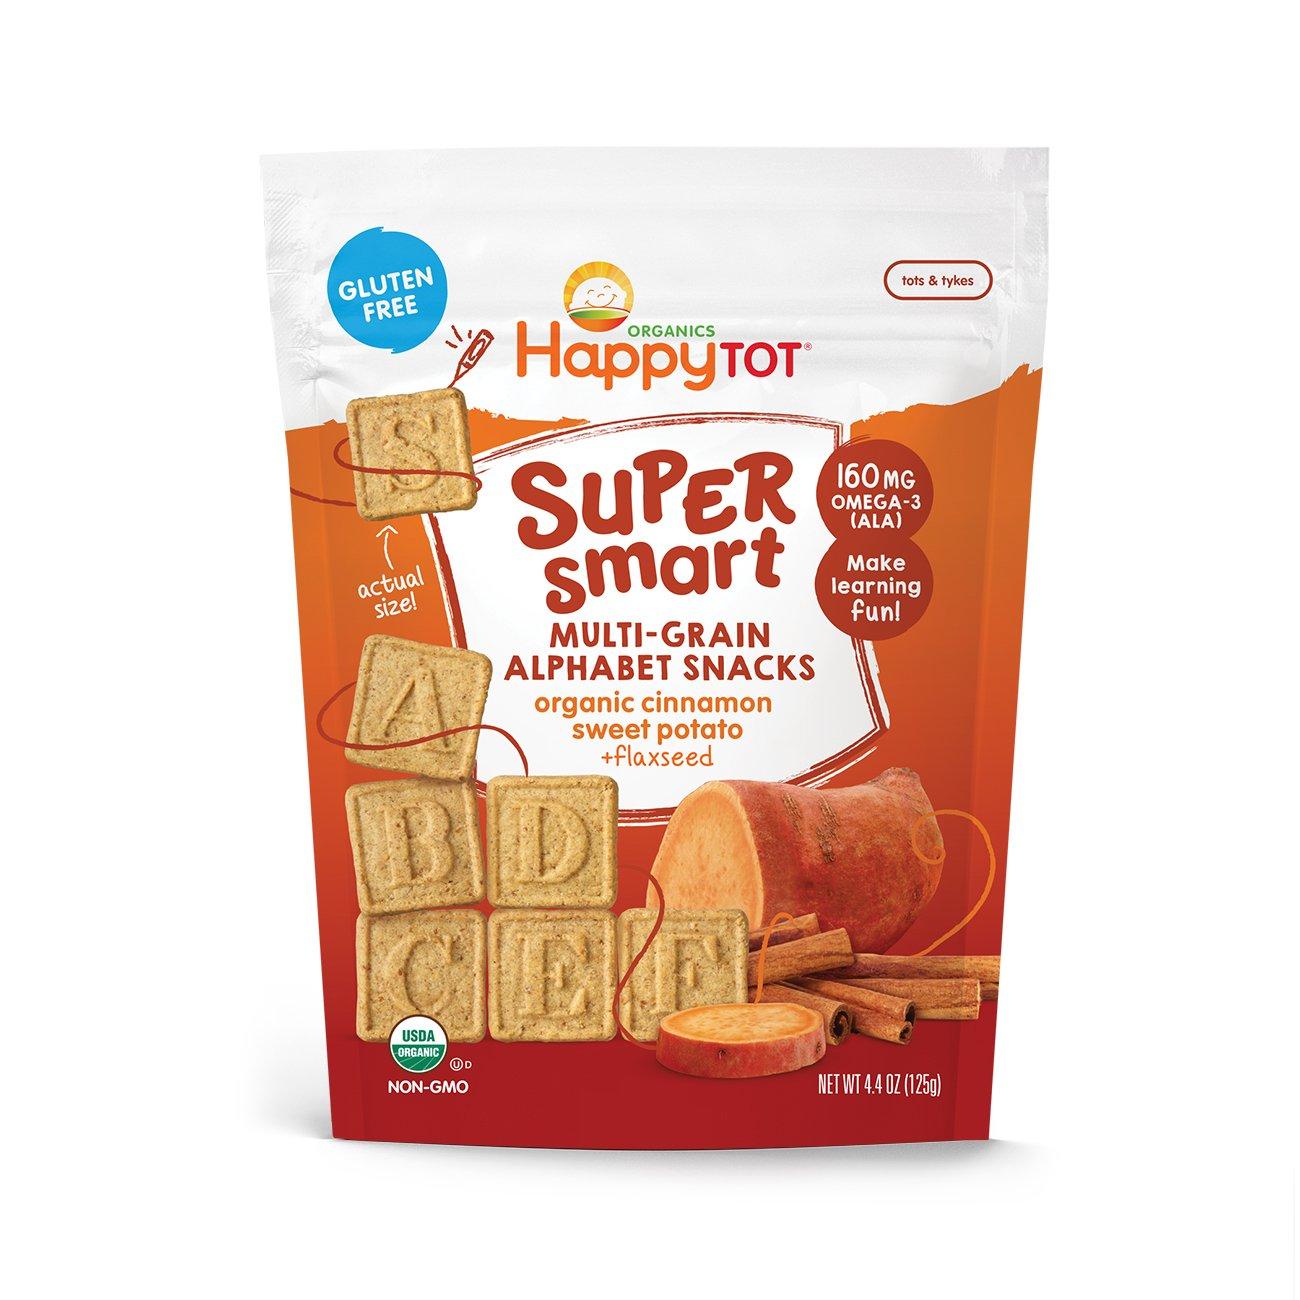 Happy Tot Super Smart Snacks, Organic Toddler Snack, Cinnamon, Sweet Potato + Flaxseed, 4.4 Ounce Bag